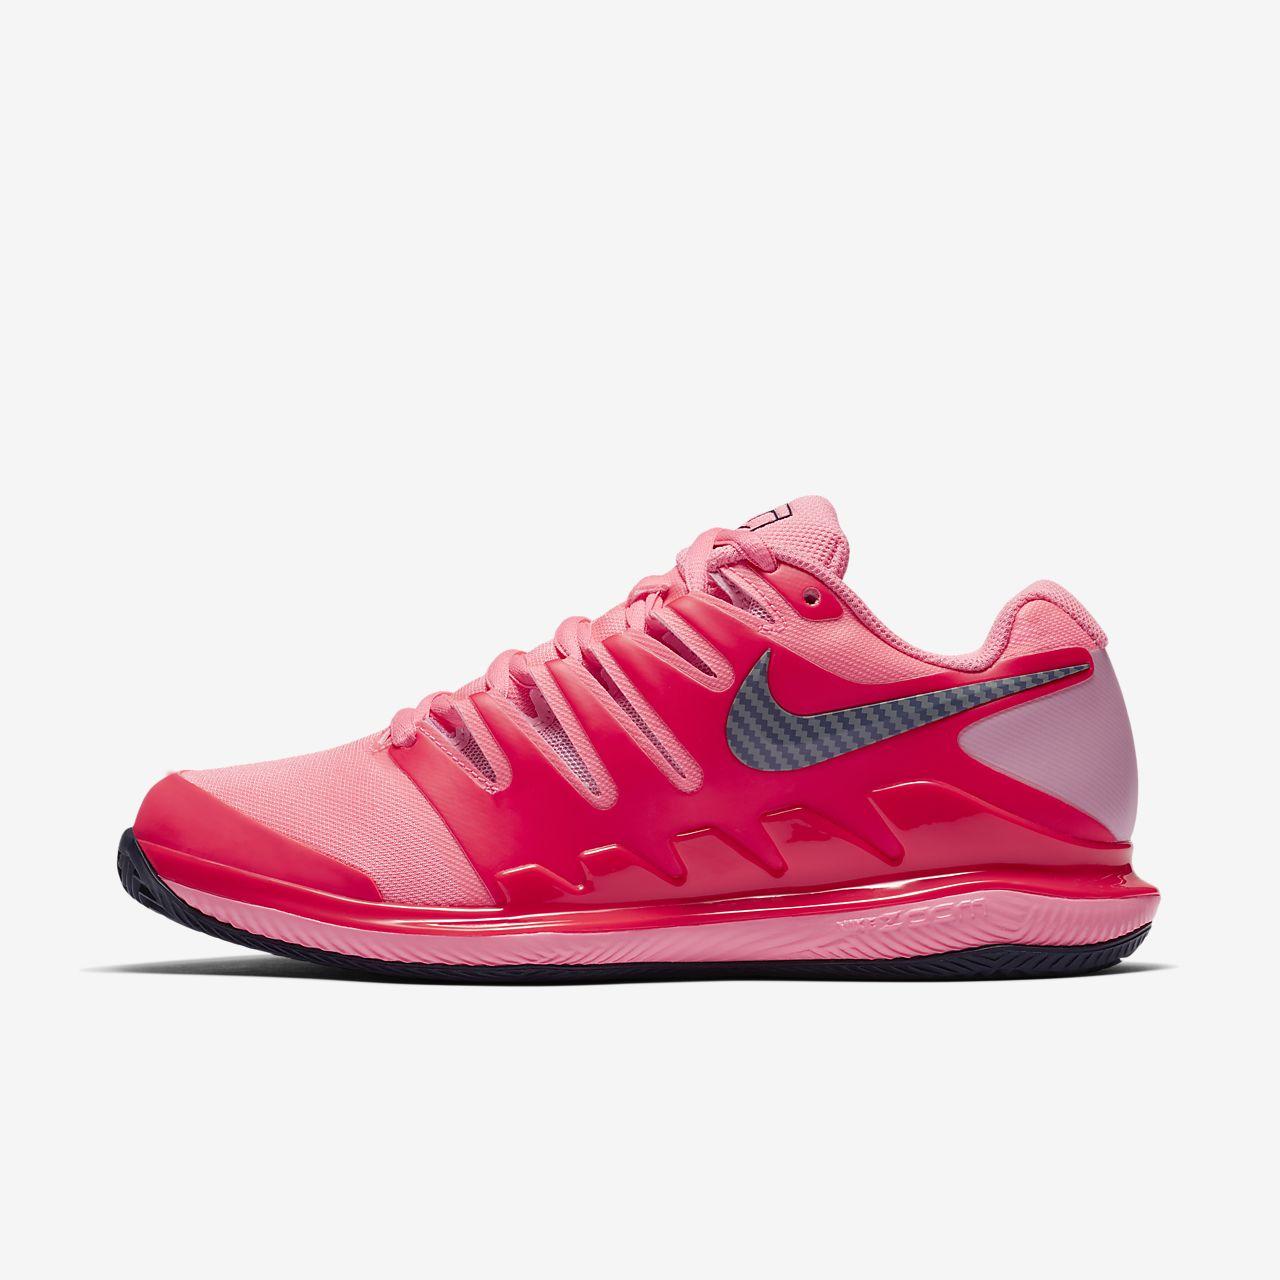 Scarpa da tennis per campi in terra rossa NikeCourt Air Zoom Vapor X Donna